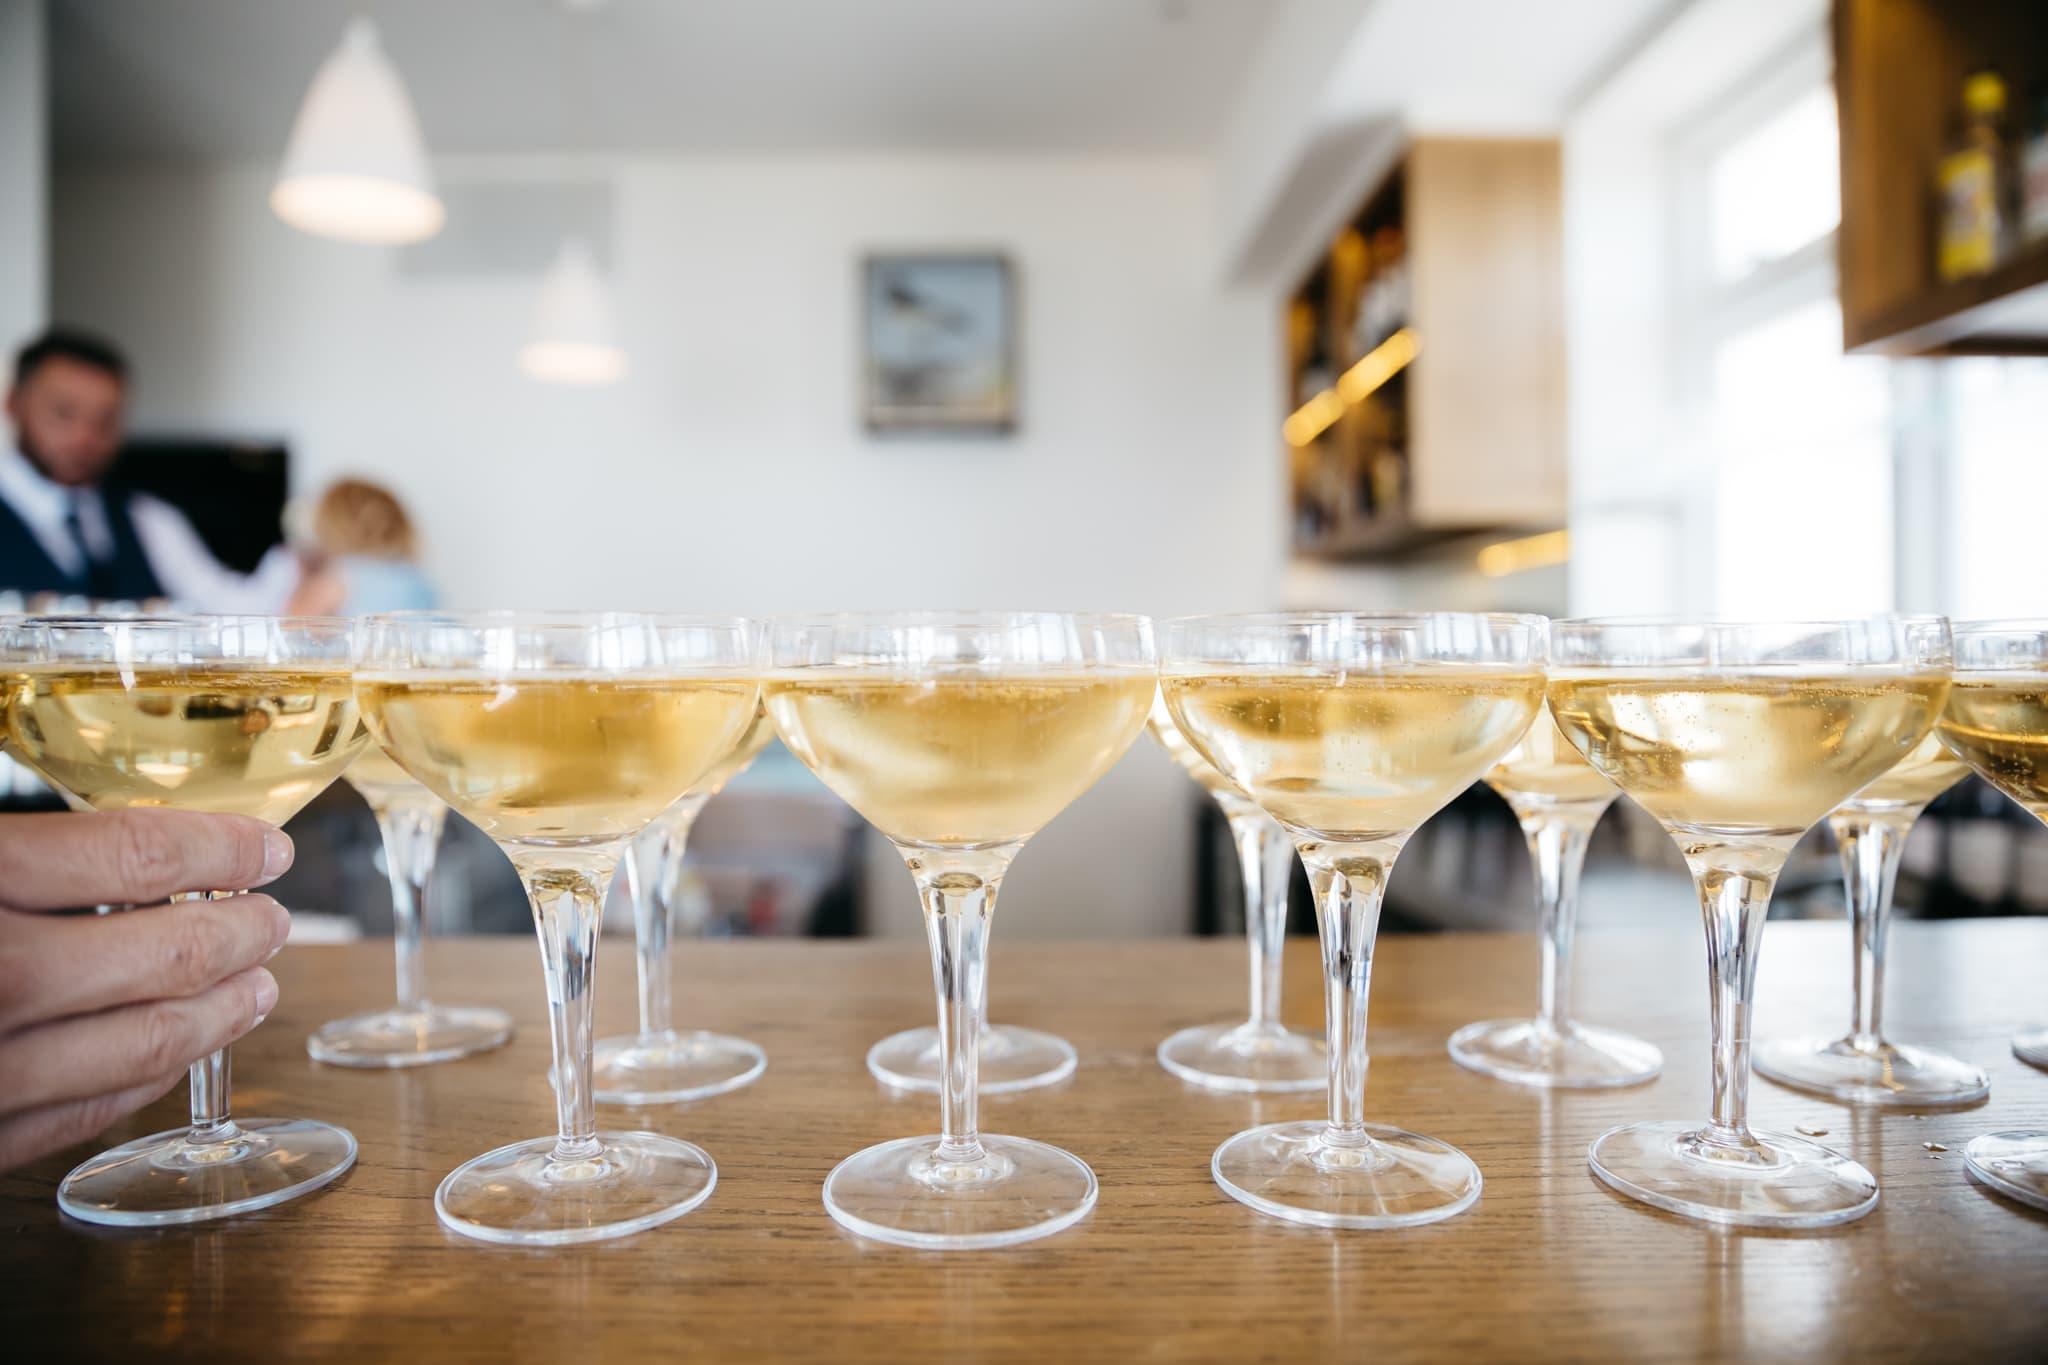 Champagne glasses for wedding